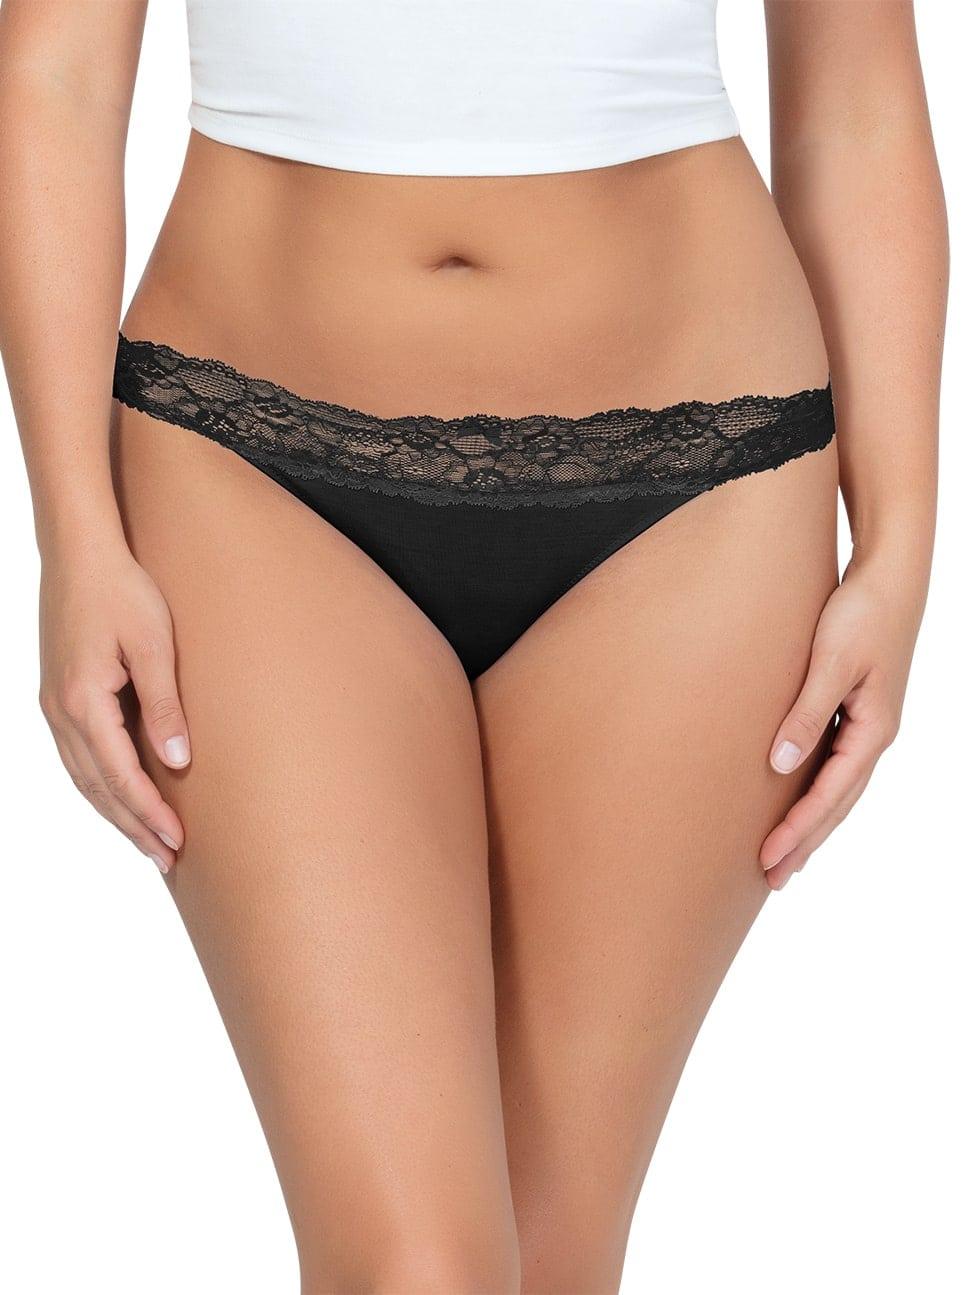 PARFAIT ParfaitPanty SoEssential ThongPP403 Black Front - Parfait Panty So Essential Thong - Black - PP403